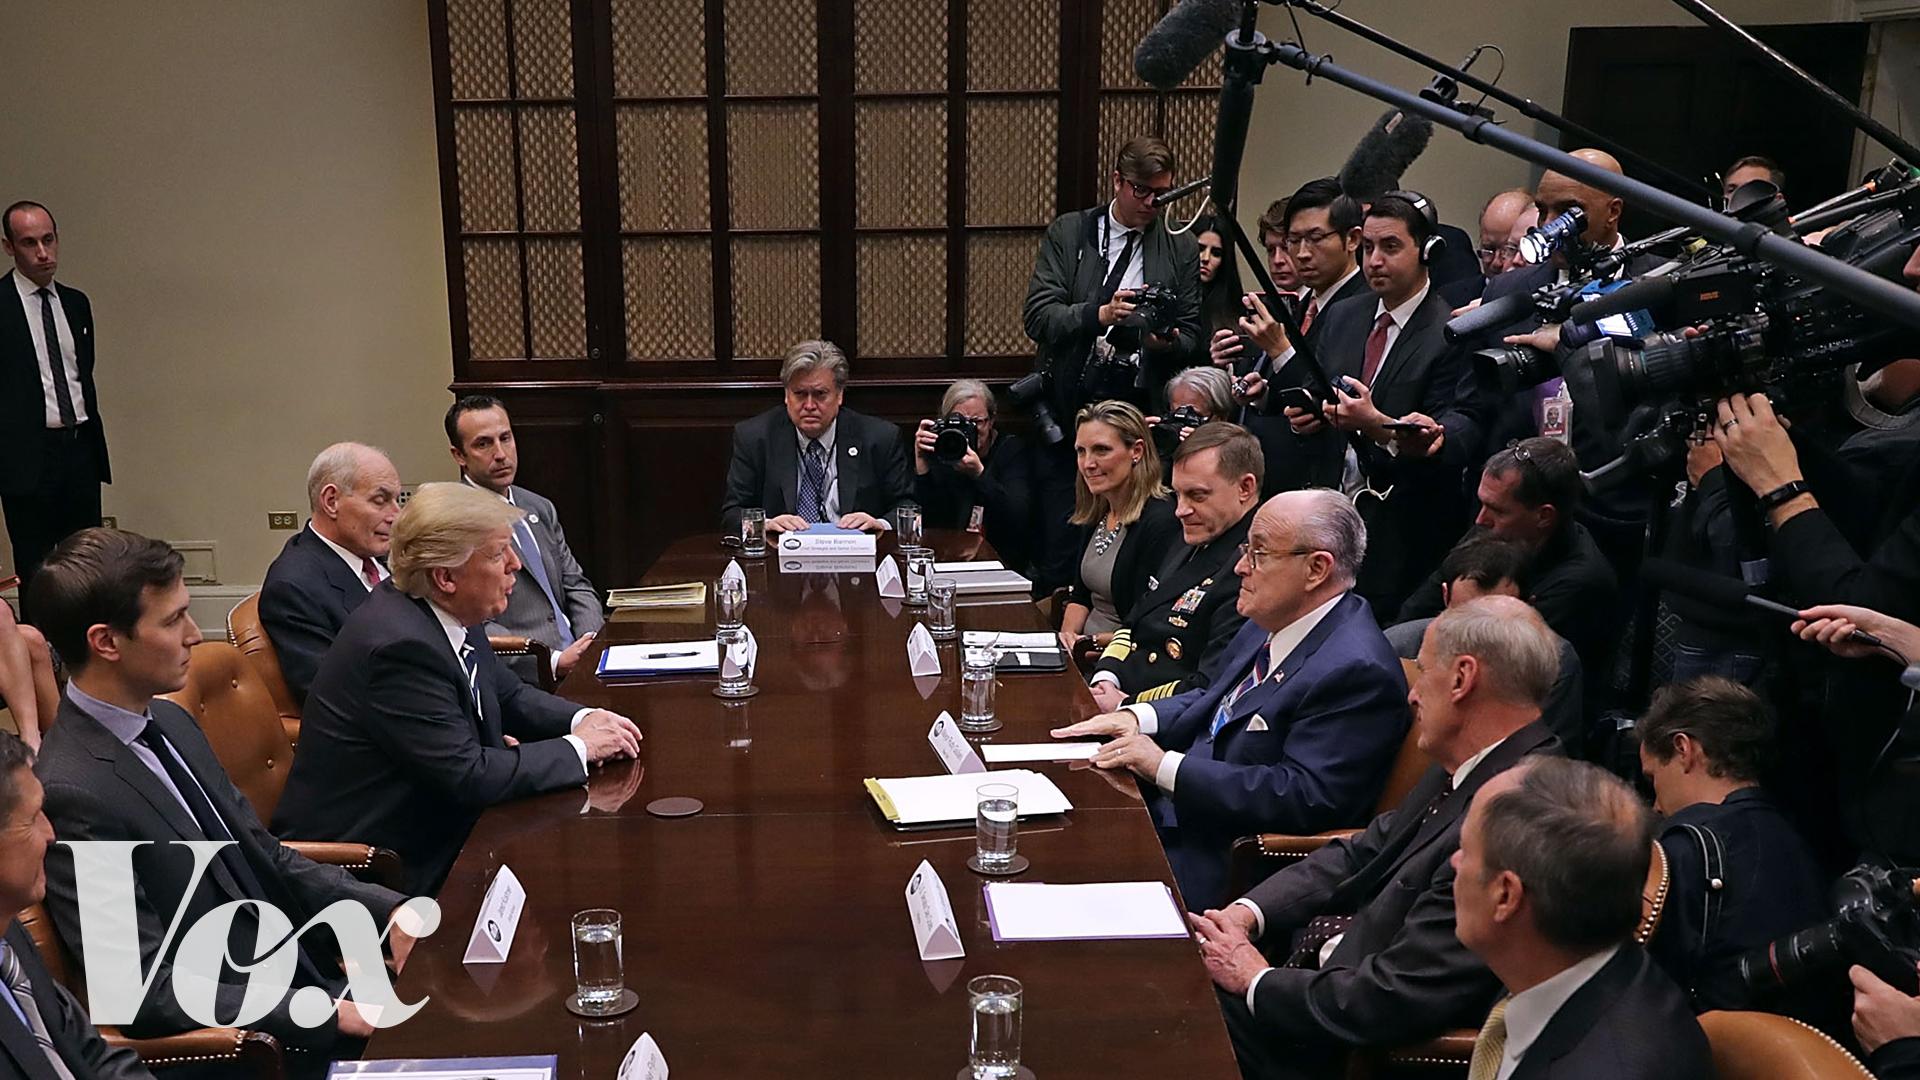 Trump faces reporters